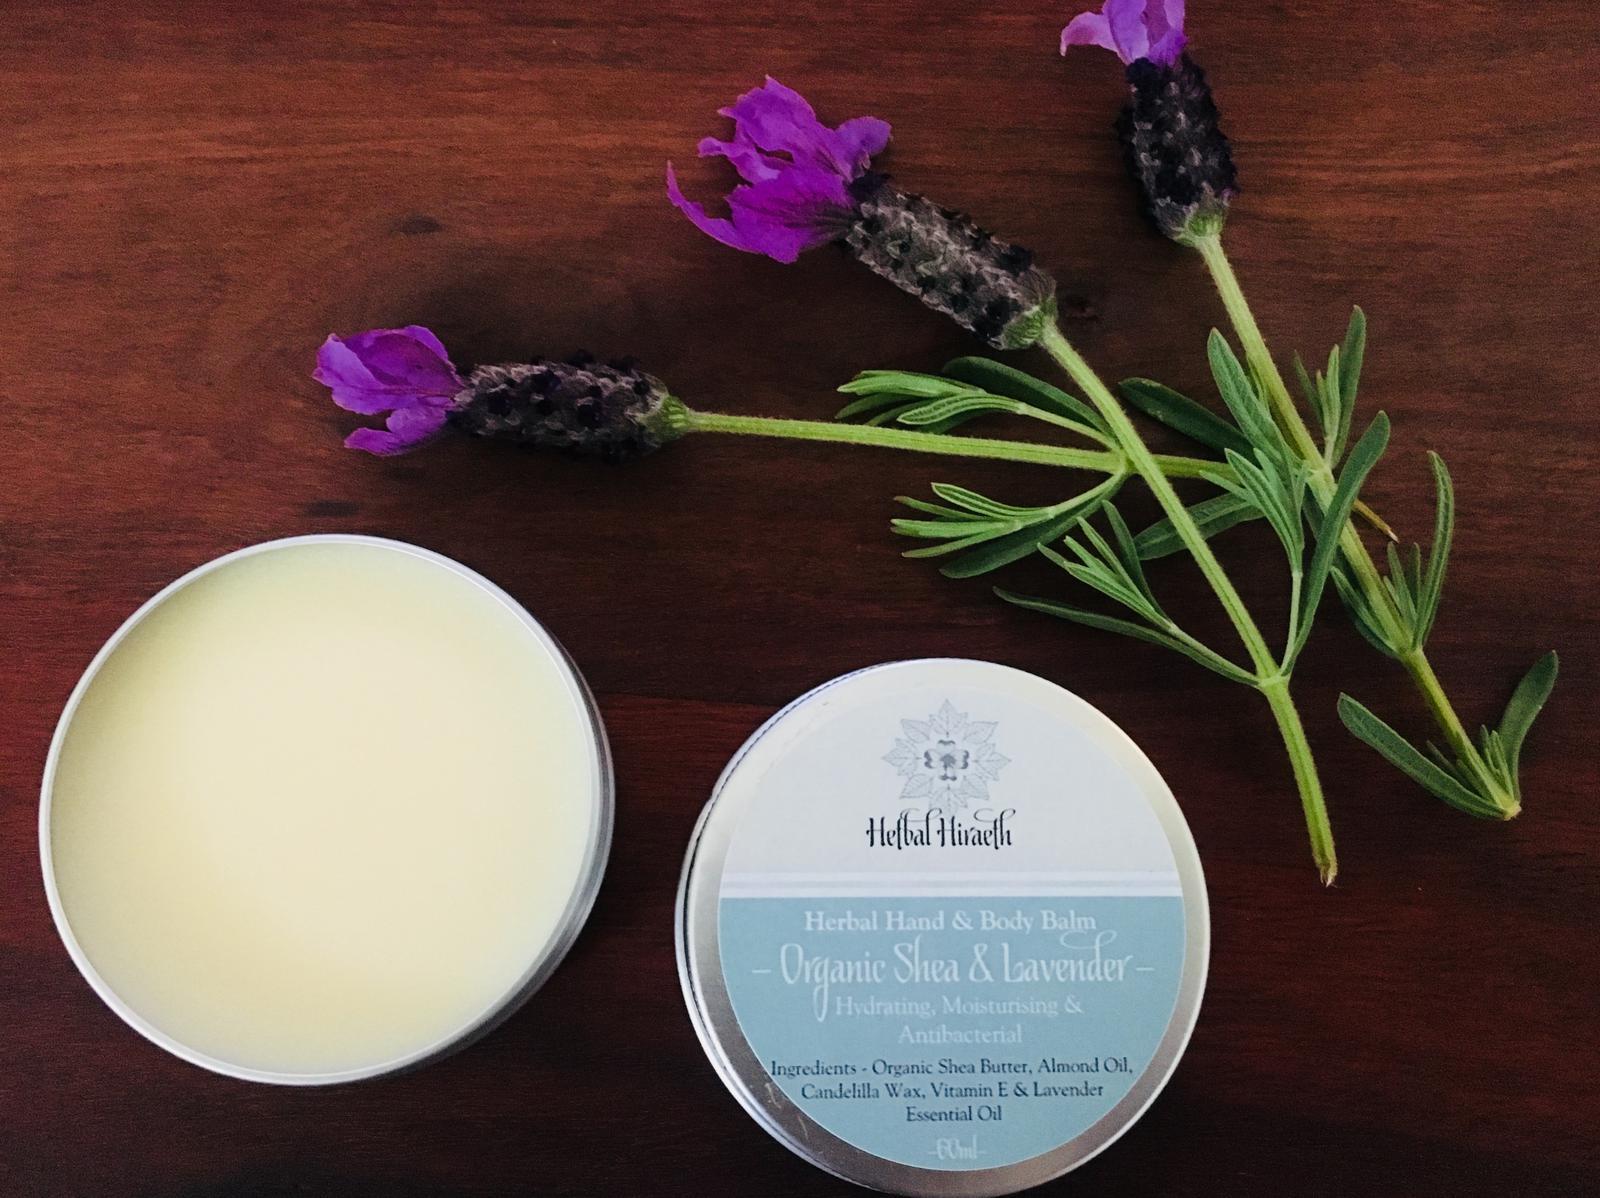 Organic Shea & Lavender Hand & Body Balm